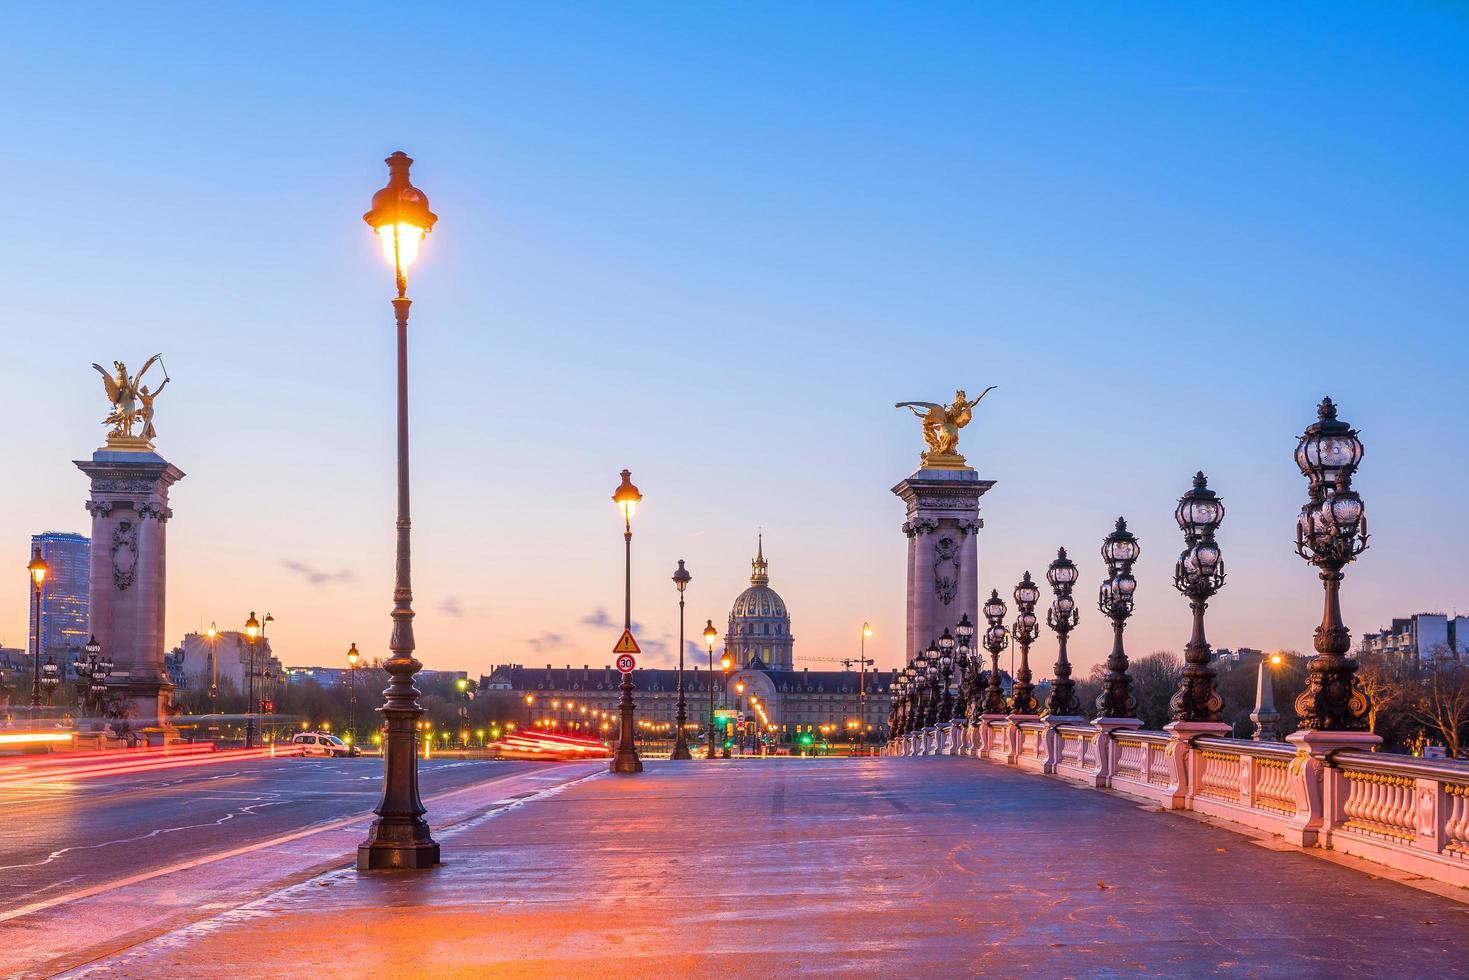 Alexander III Bridge över Seine River i Paris foto